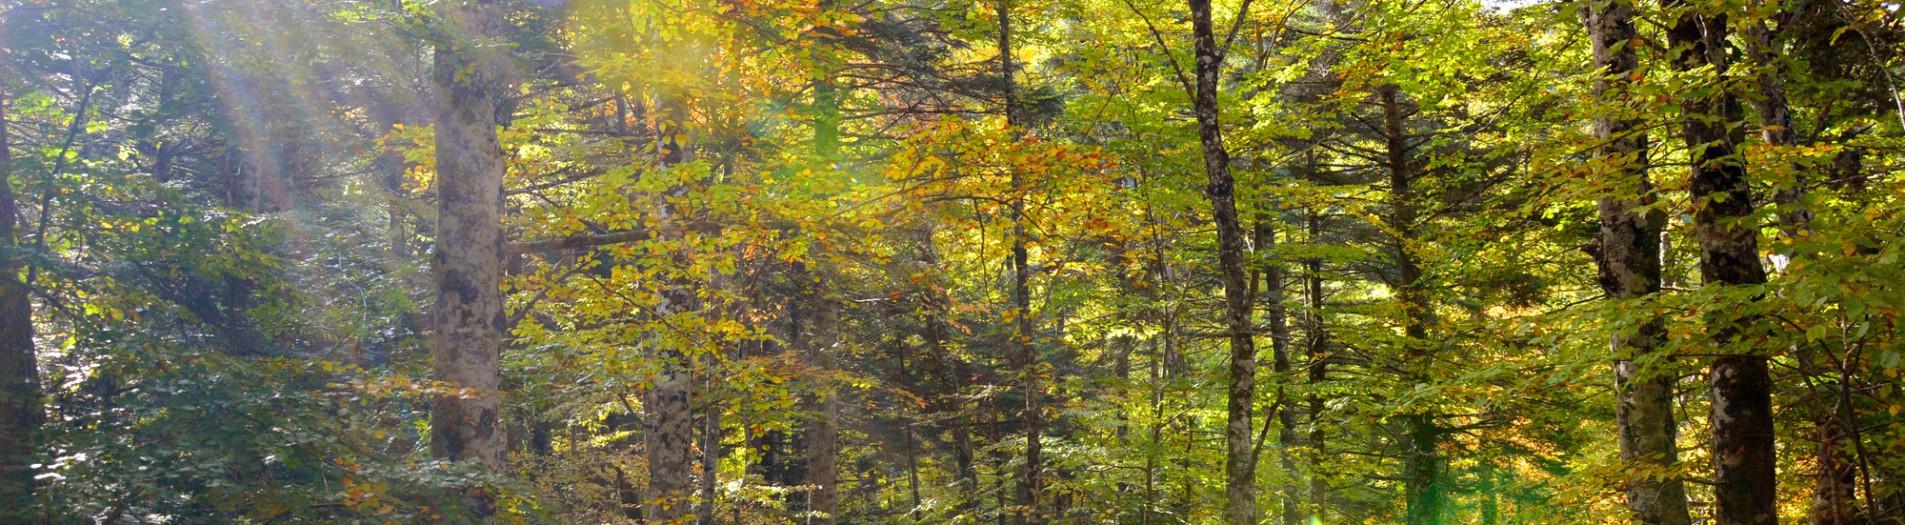 Alto Molise, into the woods